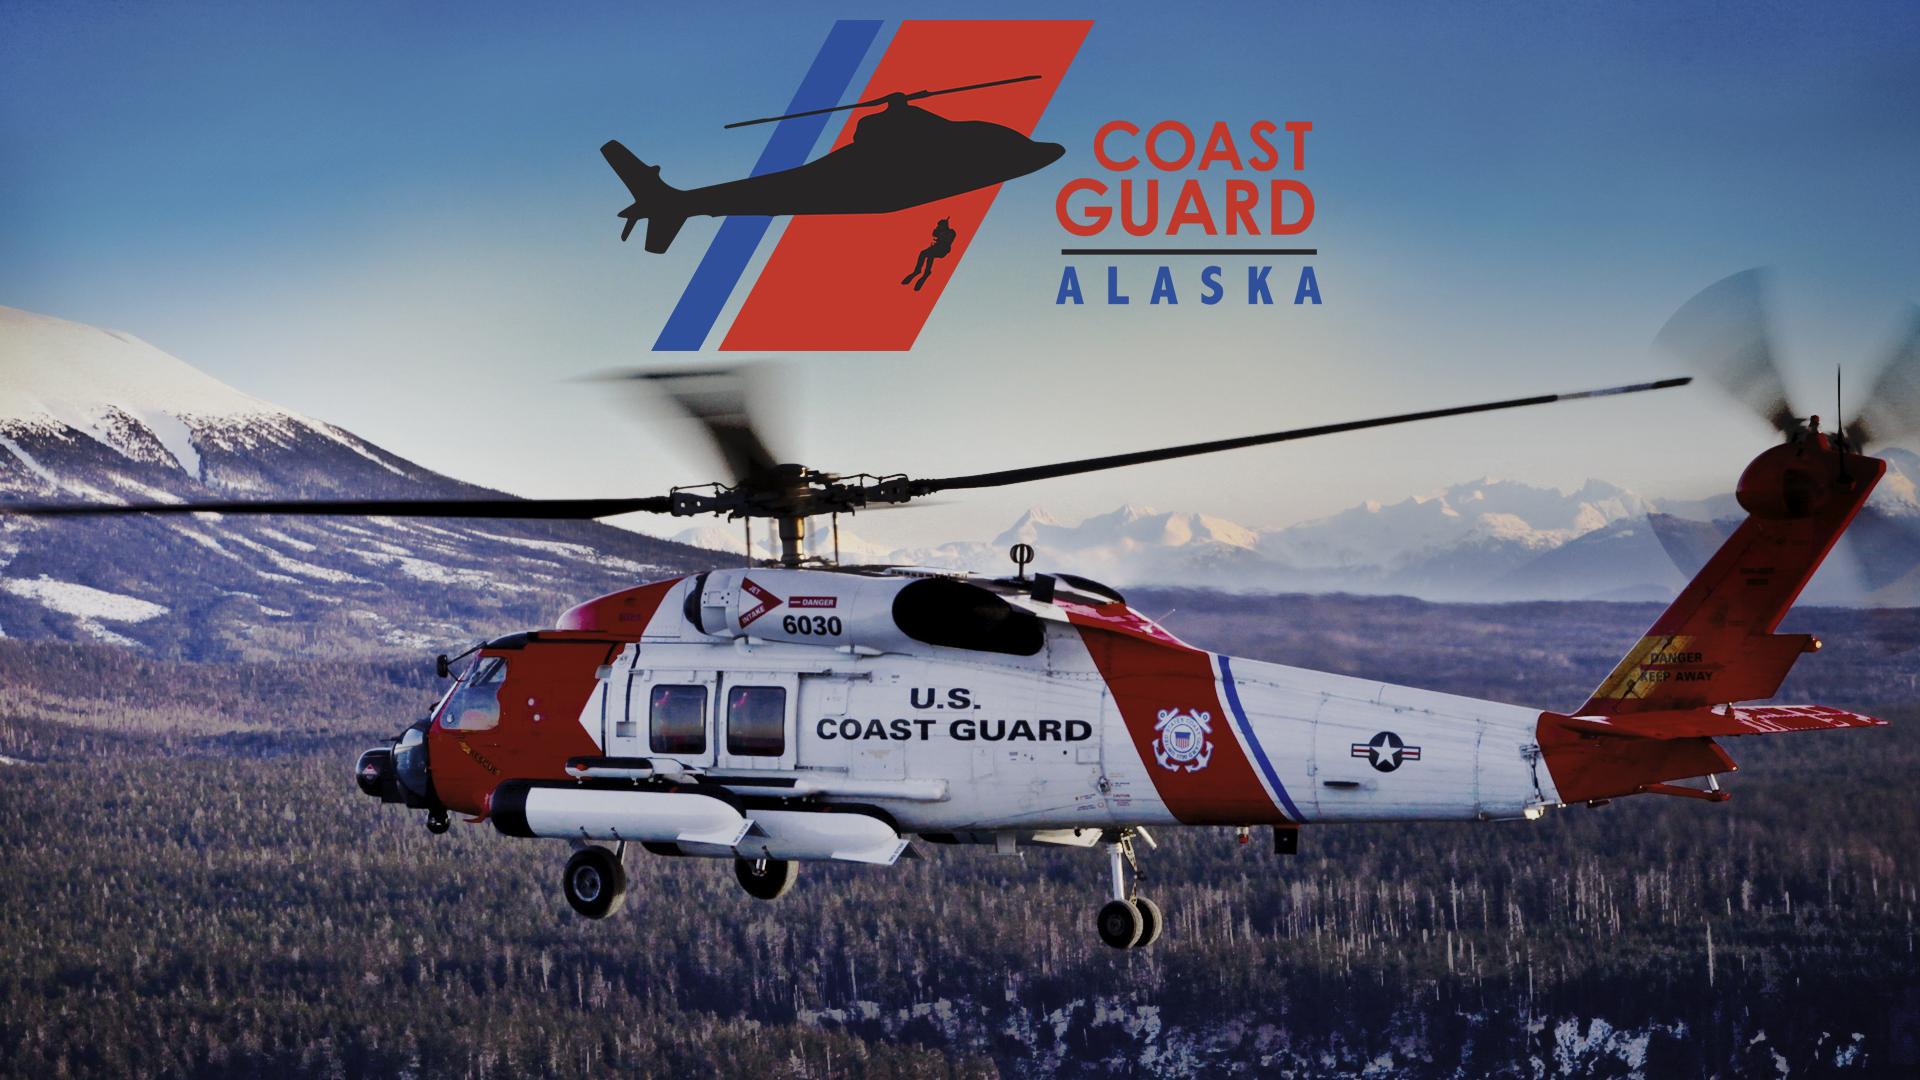 Coast Guard Alaska - Season 1